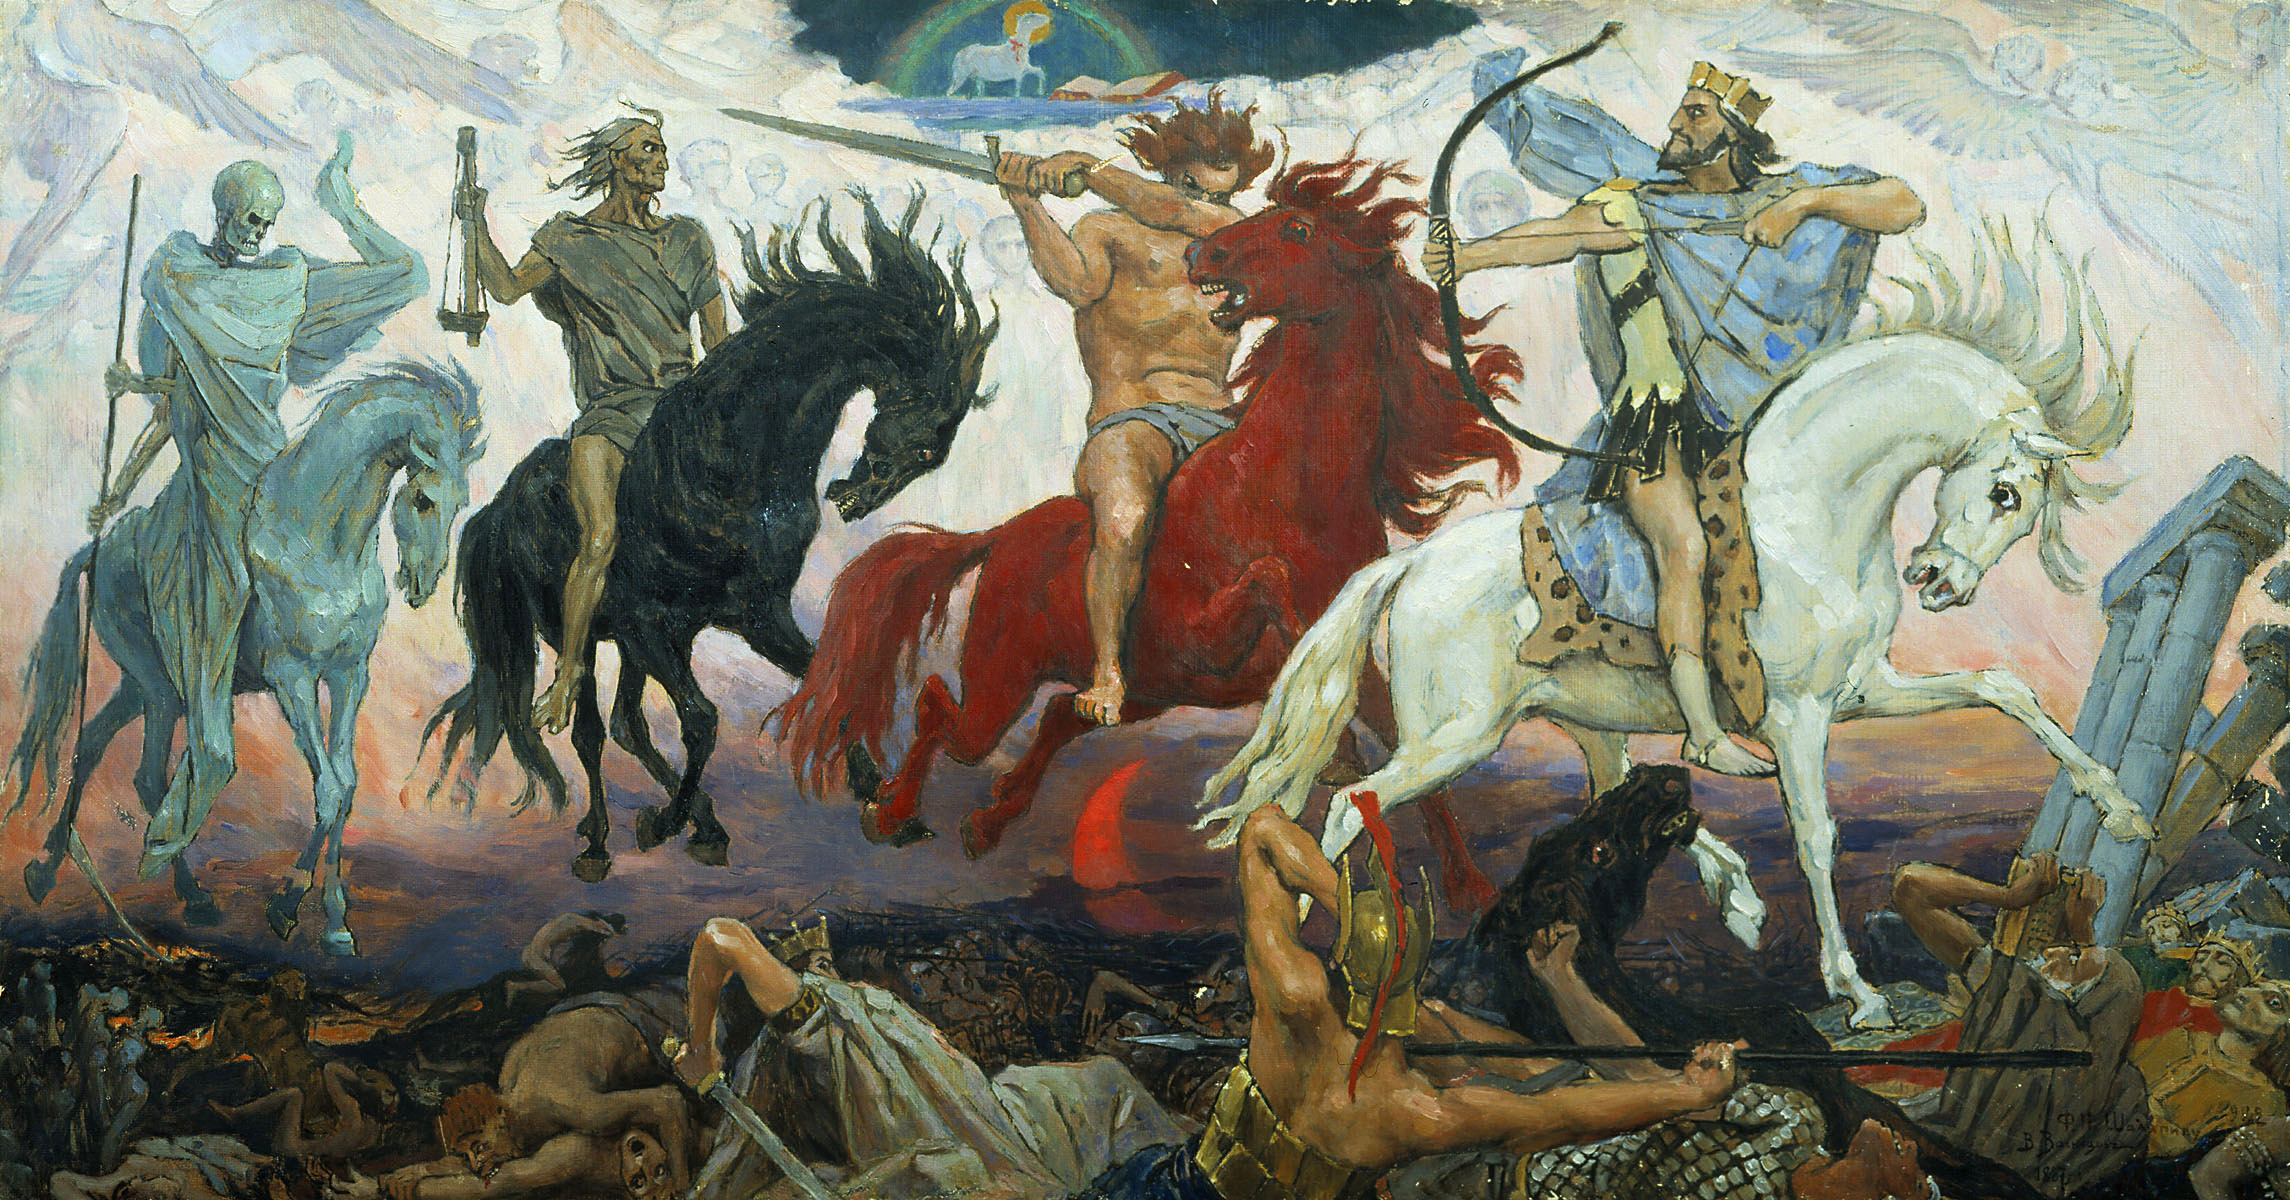 Les-Quatre-cavaliers-de-l-Apocalypse_1887_par_Viktor-Vasnetsov